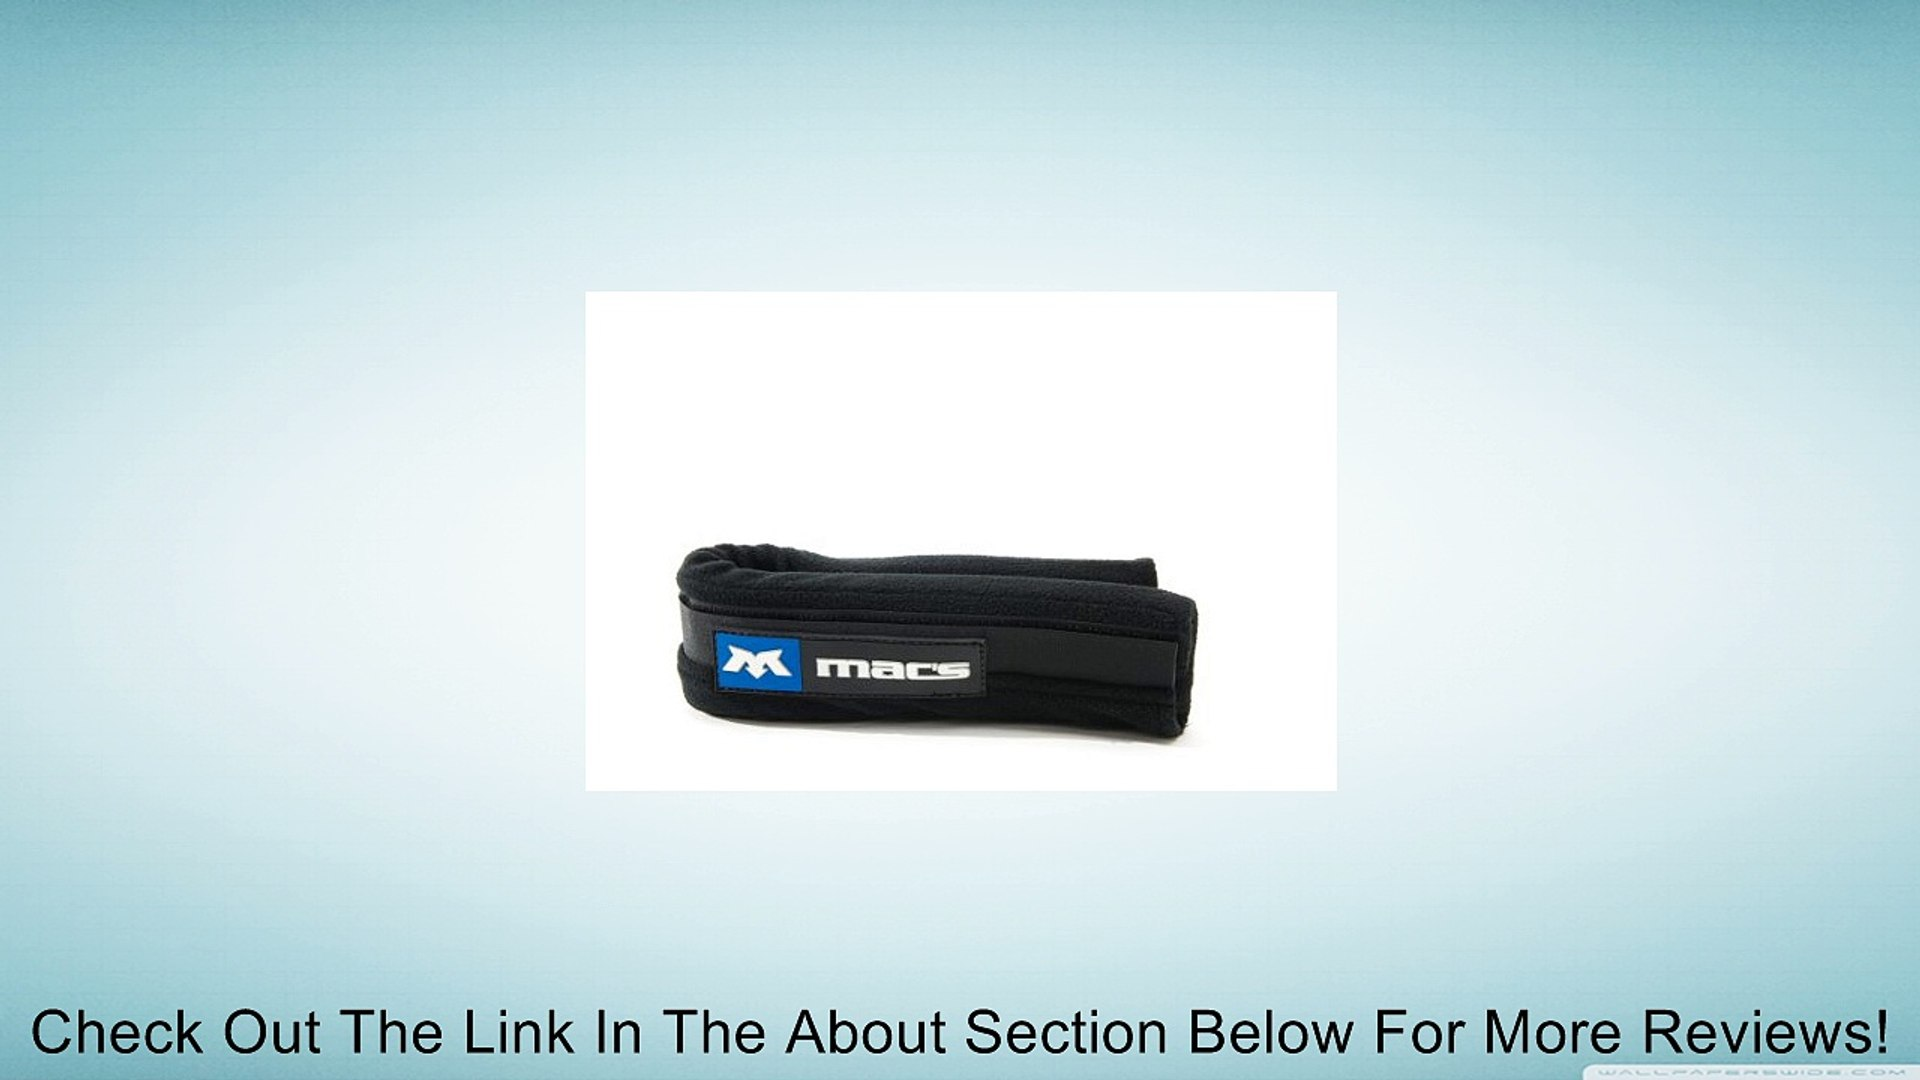 Mac Tie Downs 416002 Black 20